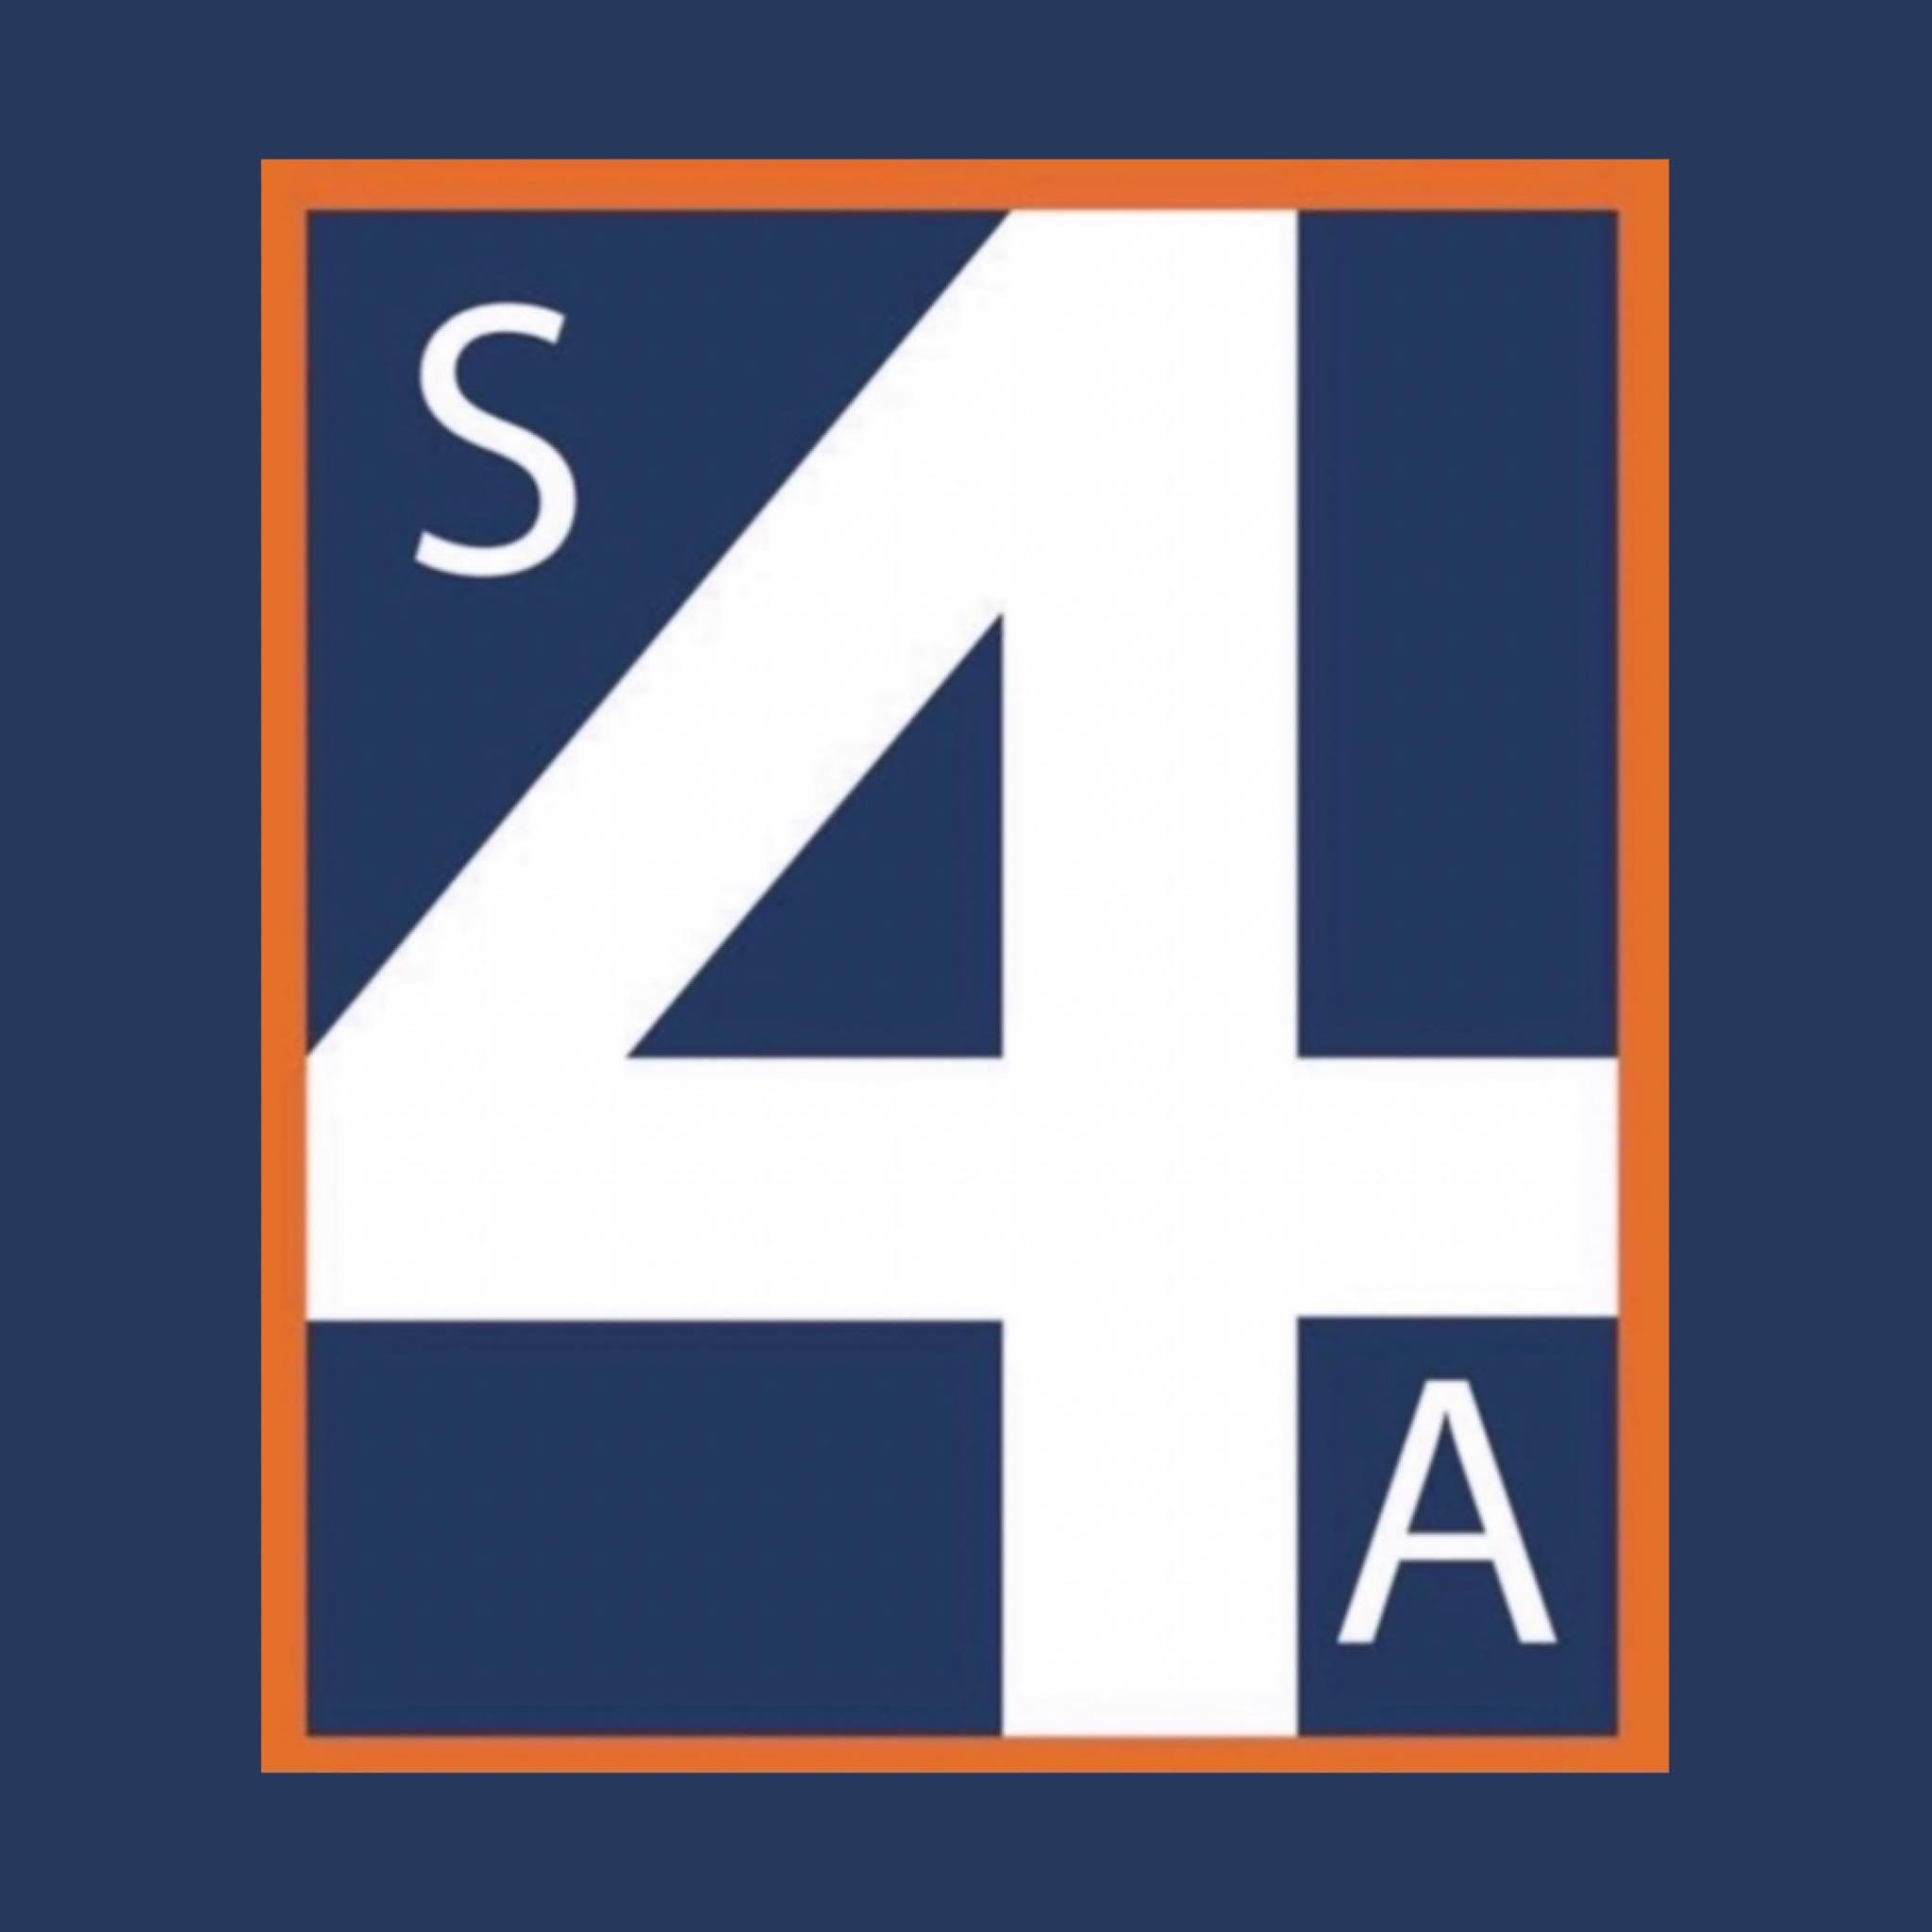 S4A Group Ltd's logo